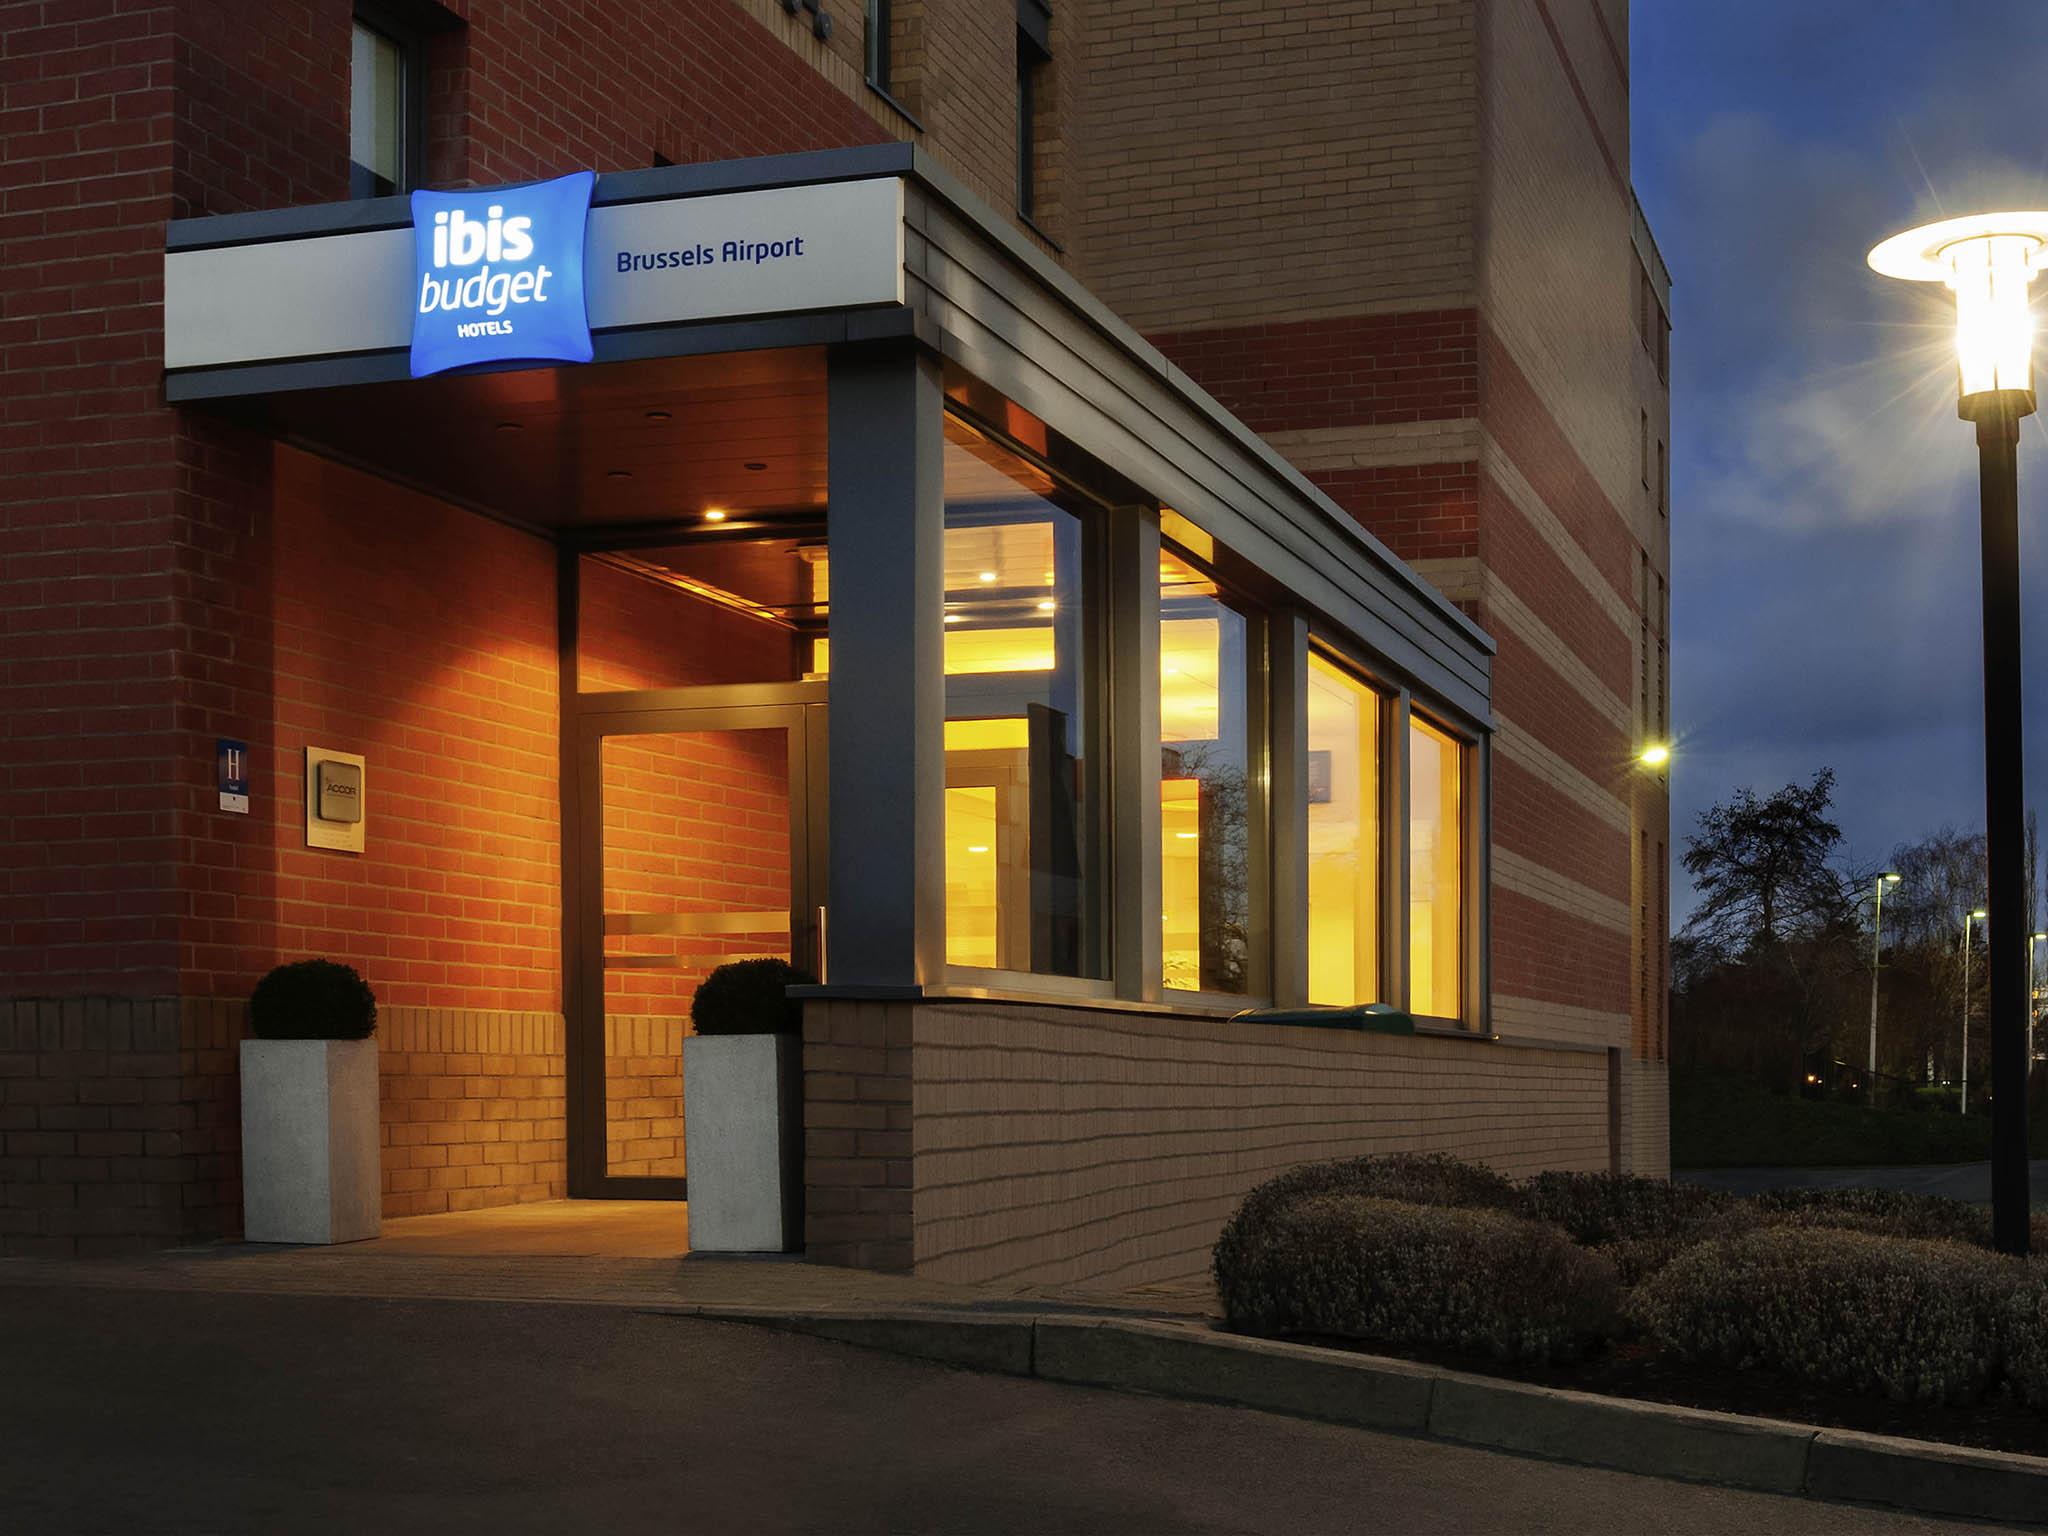 Hotel Bruxelles Ibis Budget